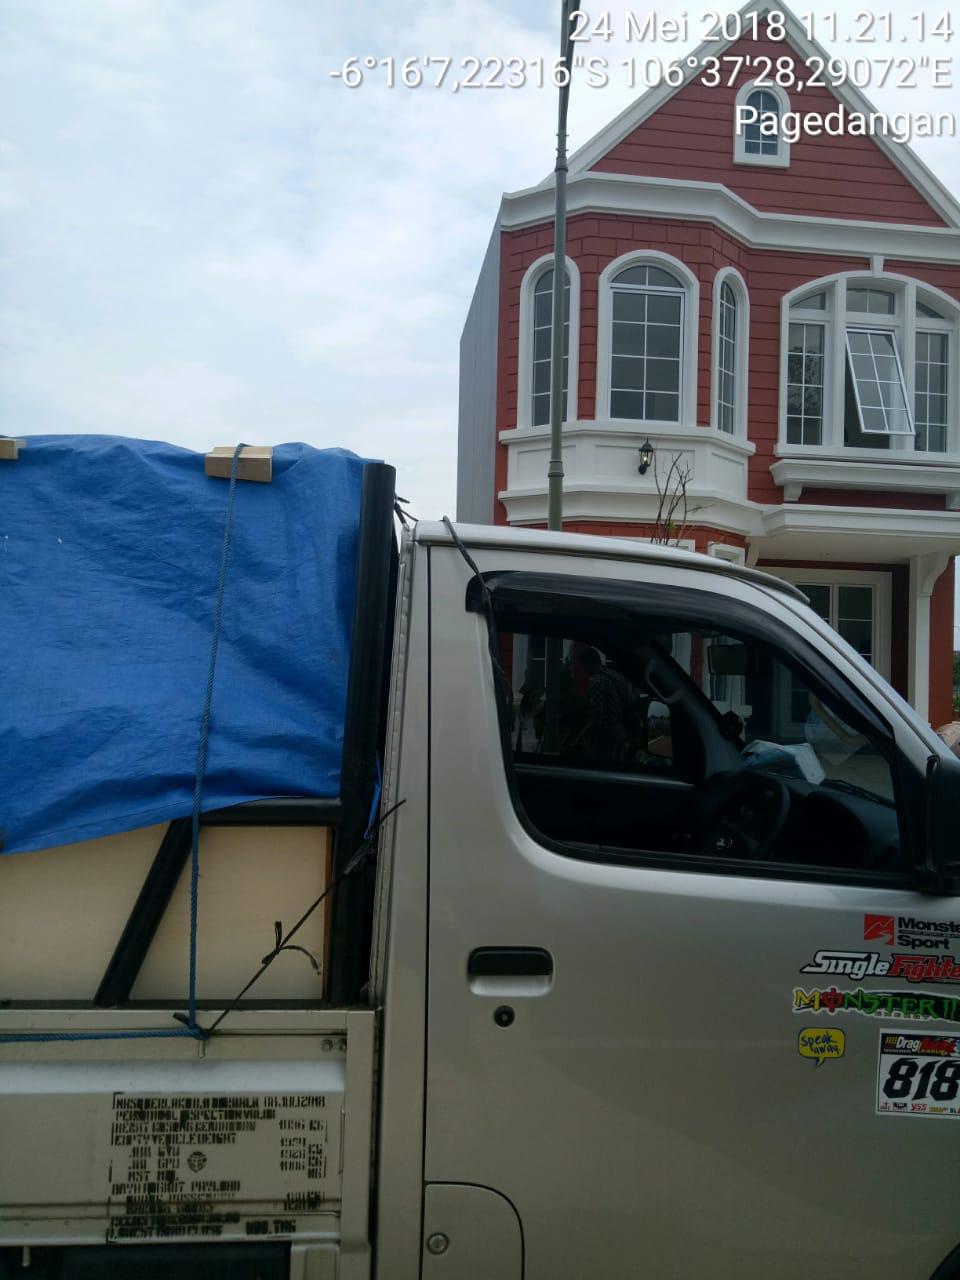 Sewa rental mobil pick up Pagedangan